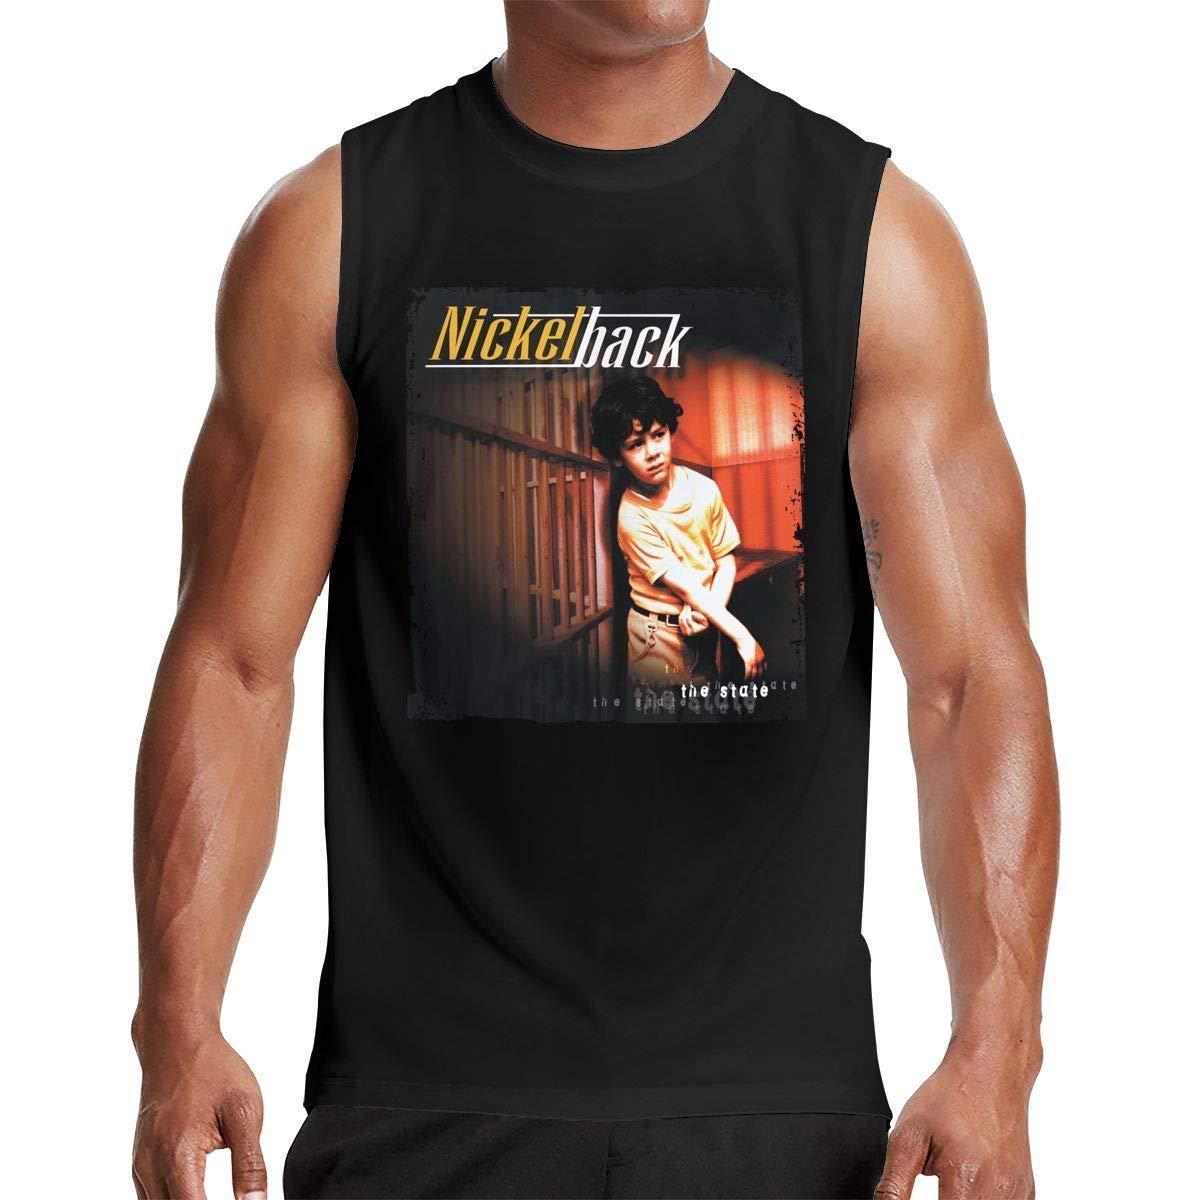 Man S Nickelback The State Classic Design Sleeveless T Shirt